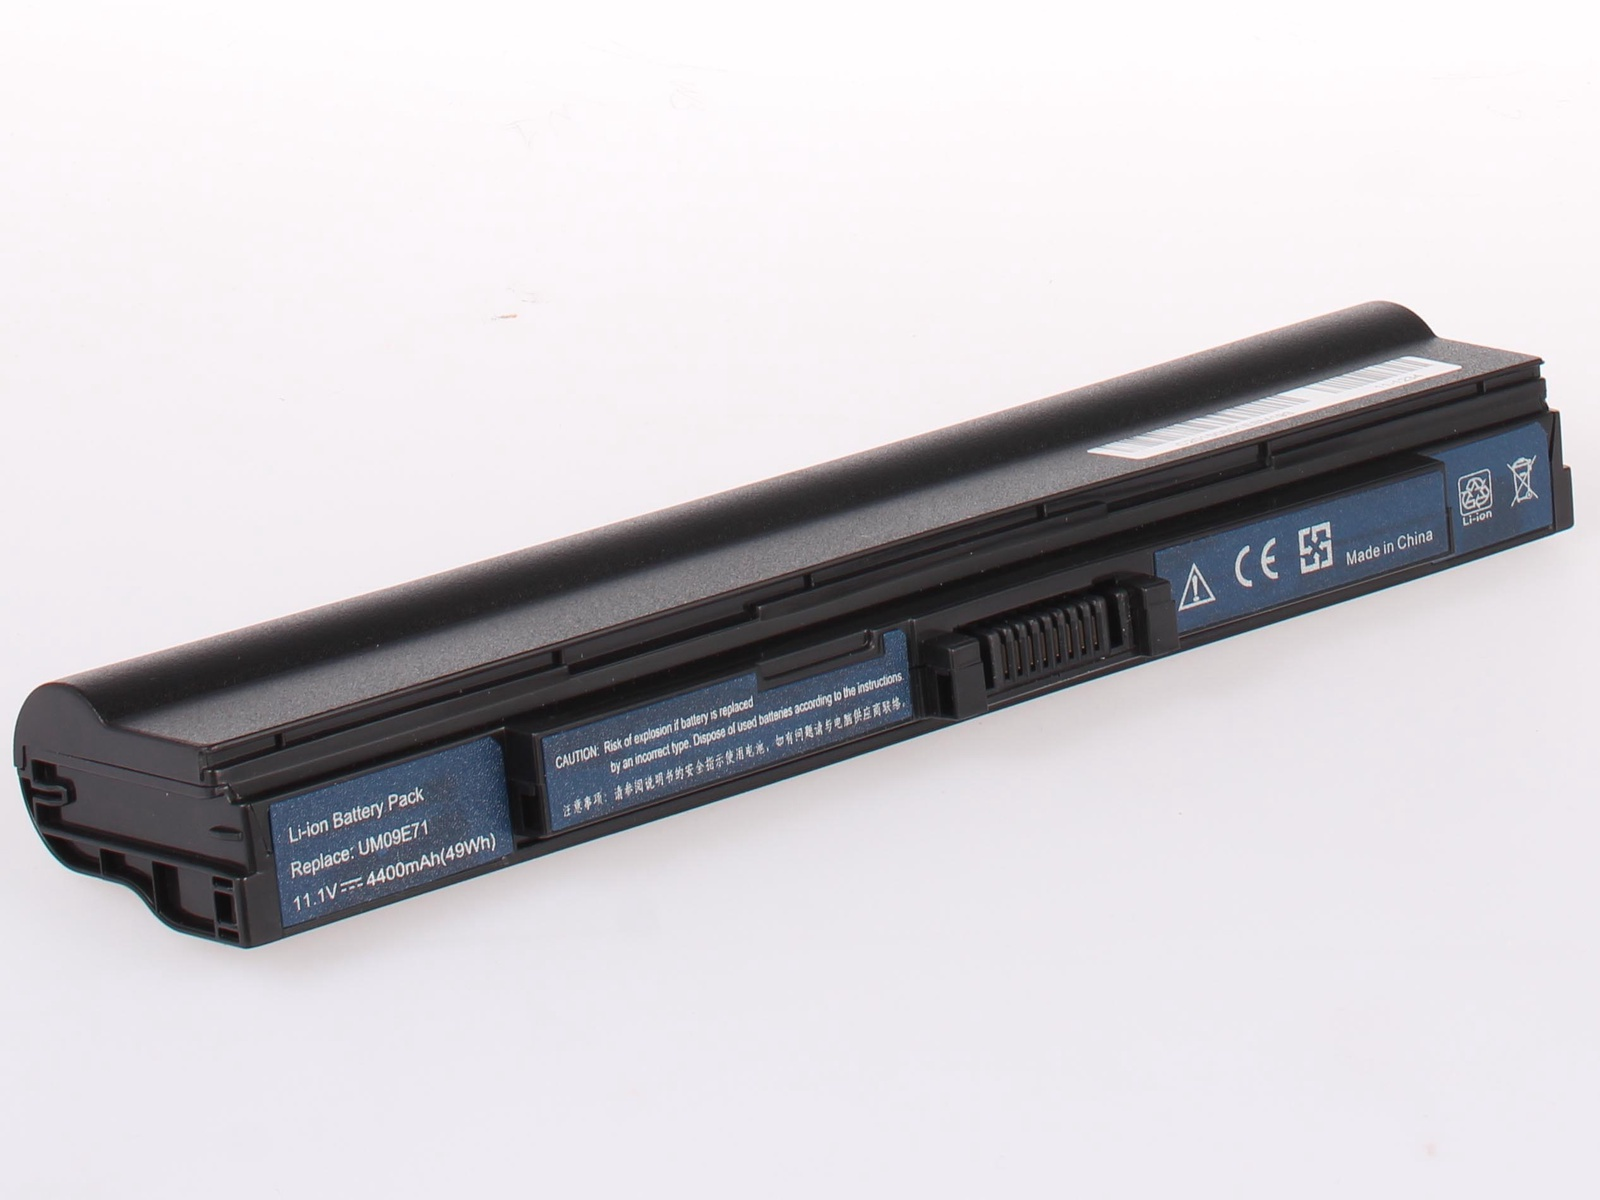 Аккумулятор для ноутбука AnyBatt для Acer Travelmate TimelineX 8172T, Aspire One AO521, Aspire 1410 722G25i, Aspire 1410-722G25i, Aspire Timeline 1810T, Aspire One AO752, Aspire Timeline 1810TZ, Ferrari One 200-314G25i цена